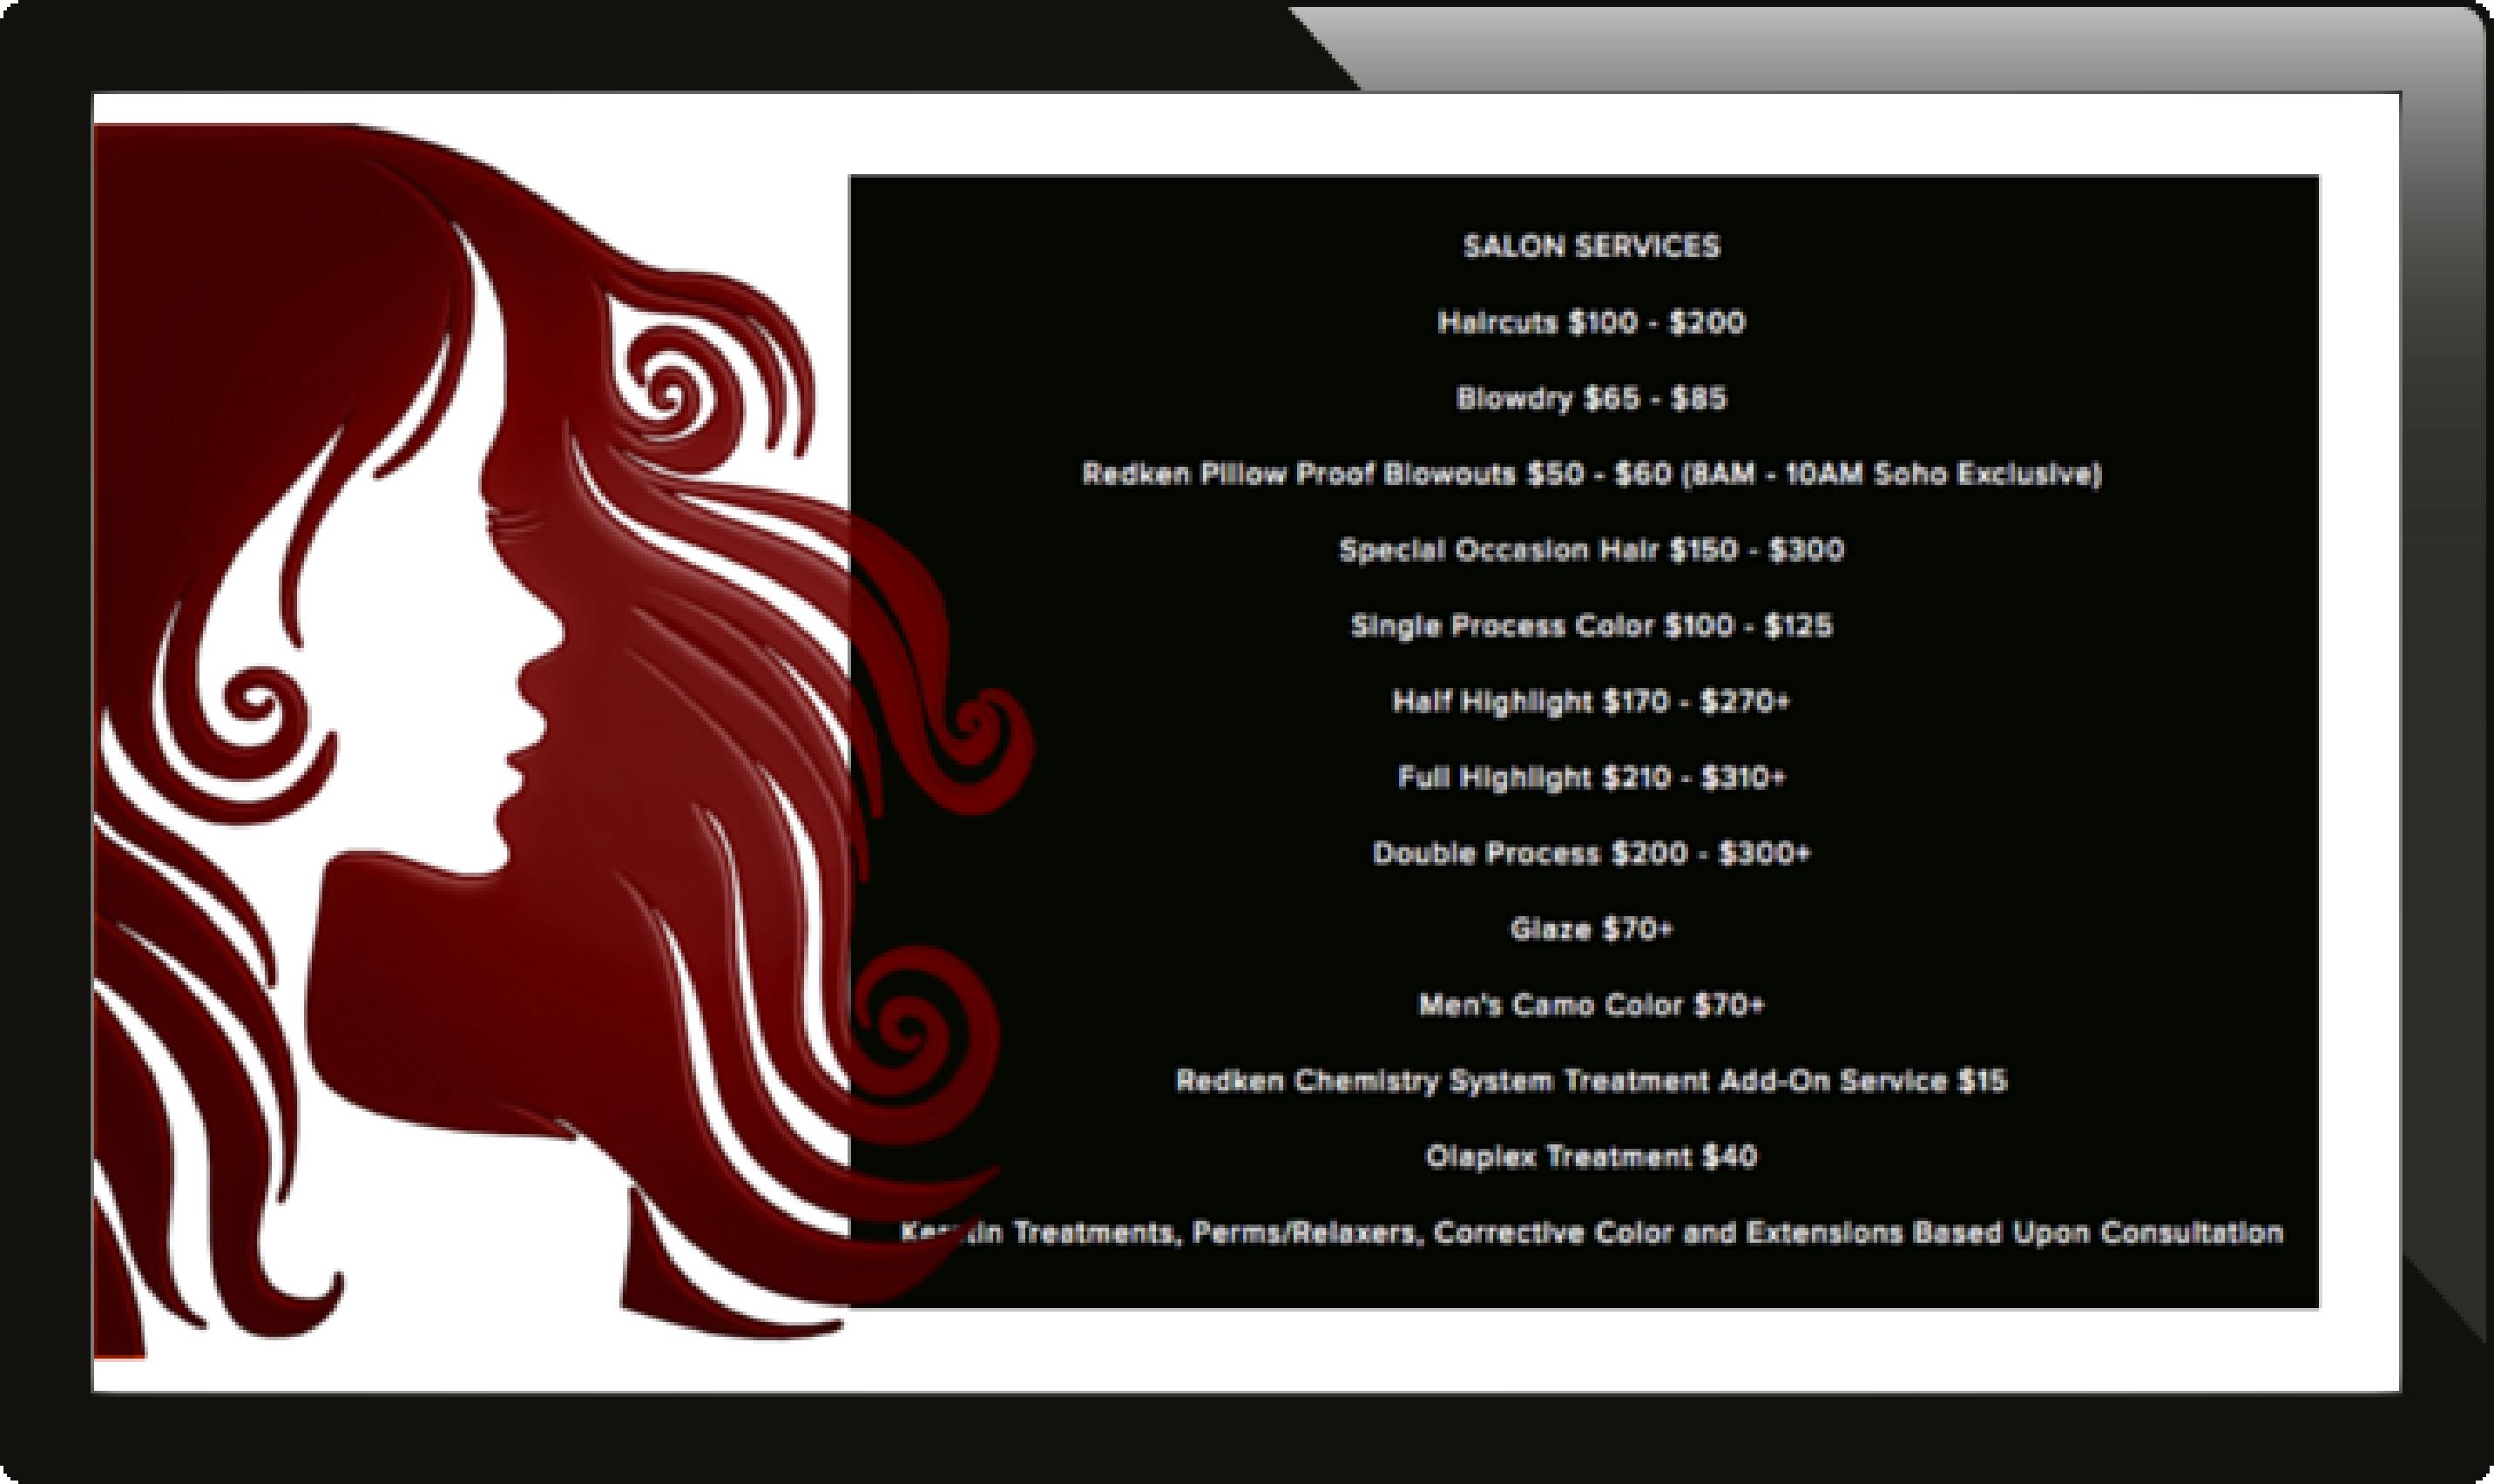 salon services list, salon services menu, salon digital signage